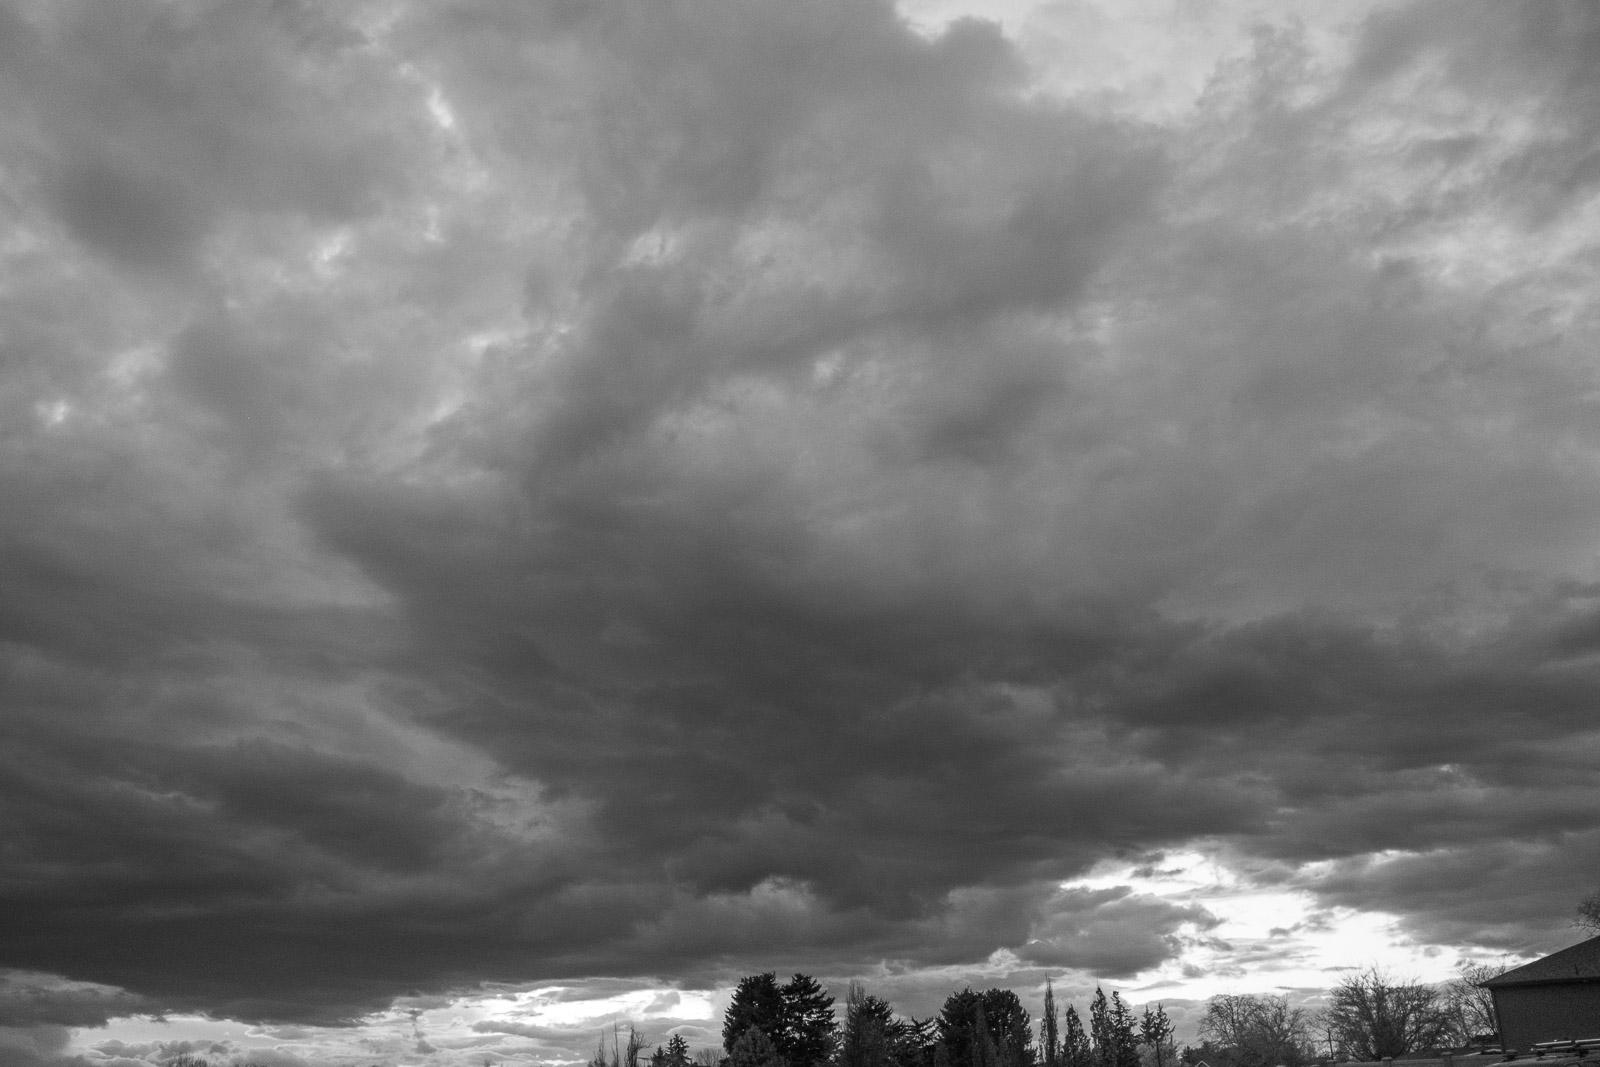 Raining day in Provo